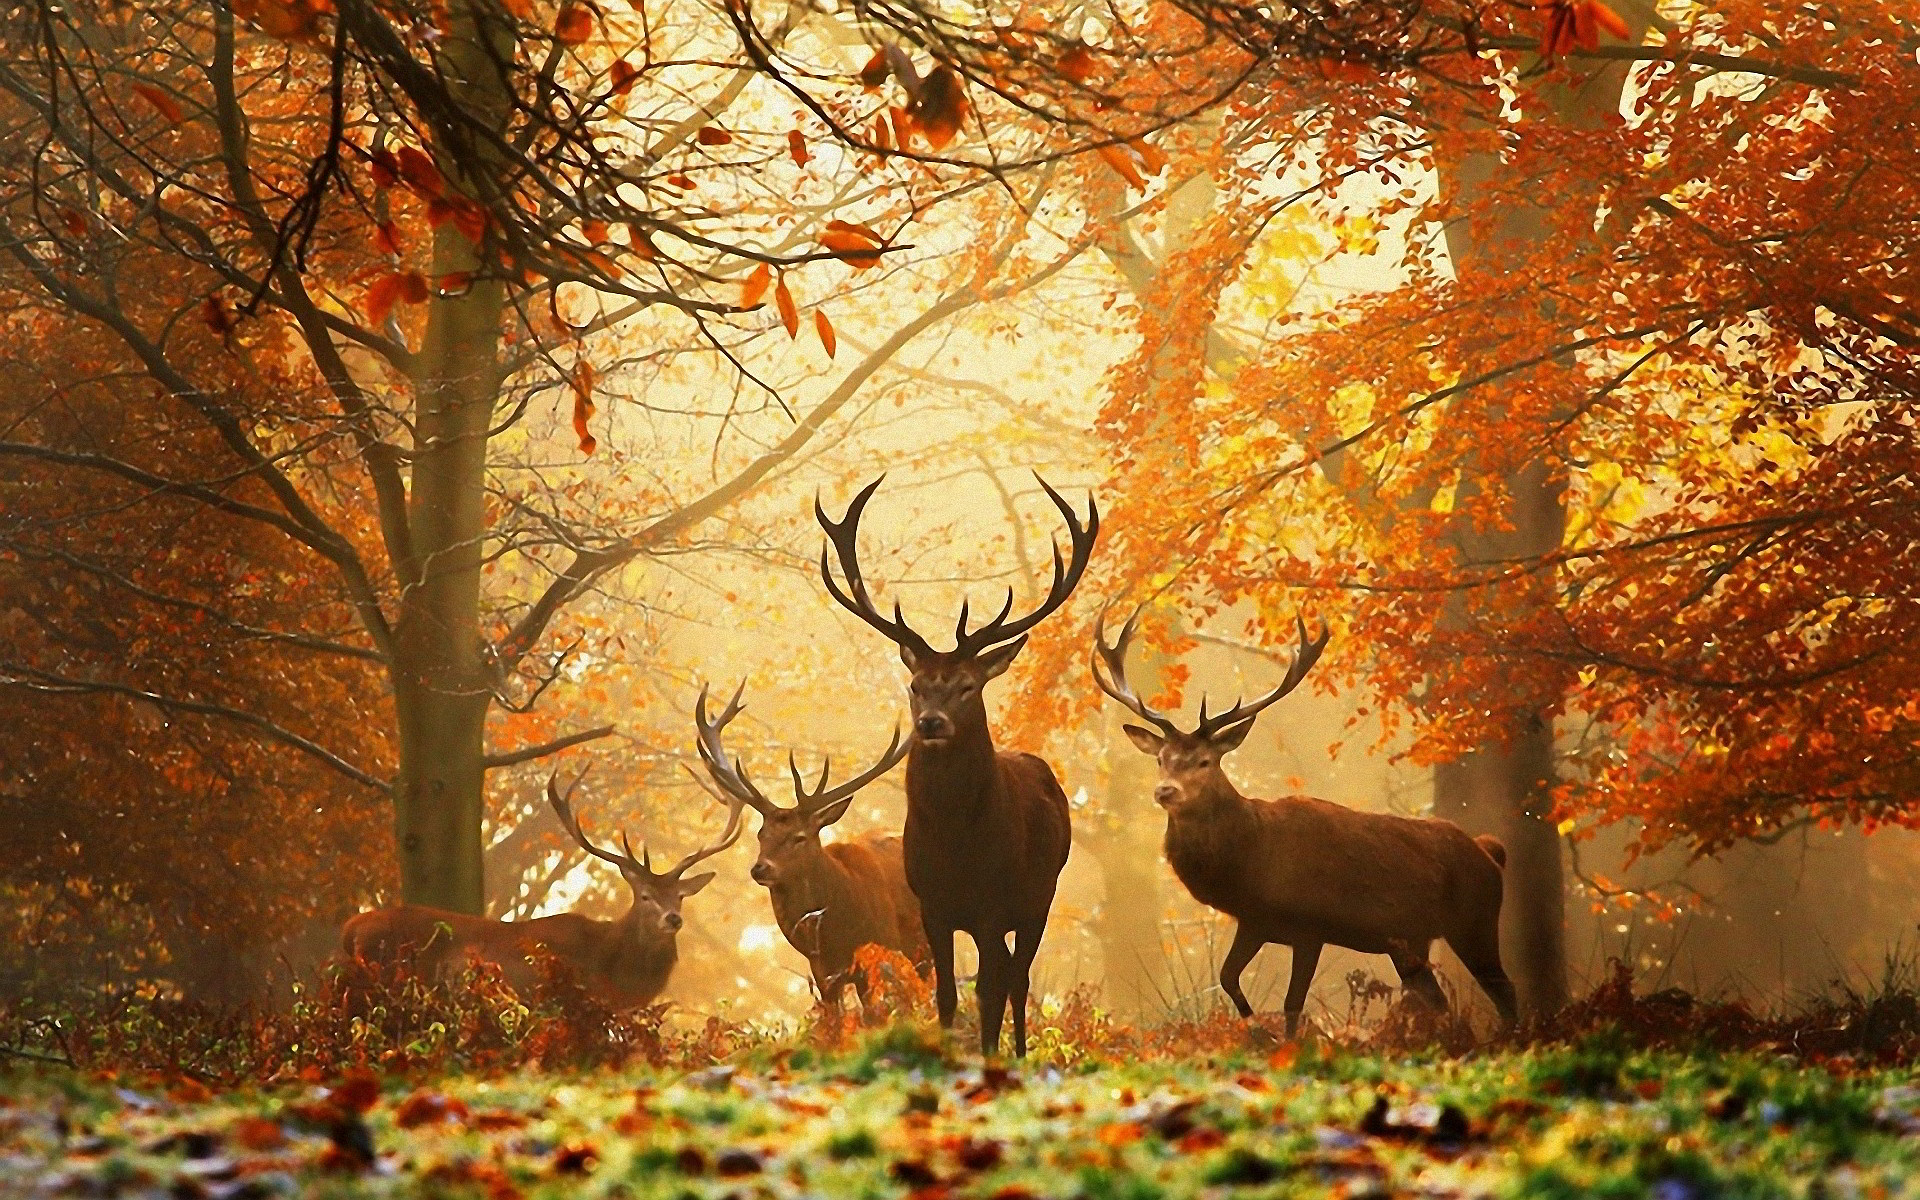 Creative Autumn Wallpapers - #WPWLN57 SHunVMall com